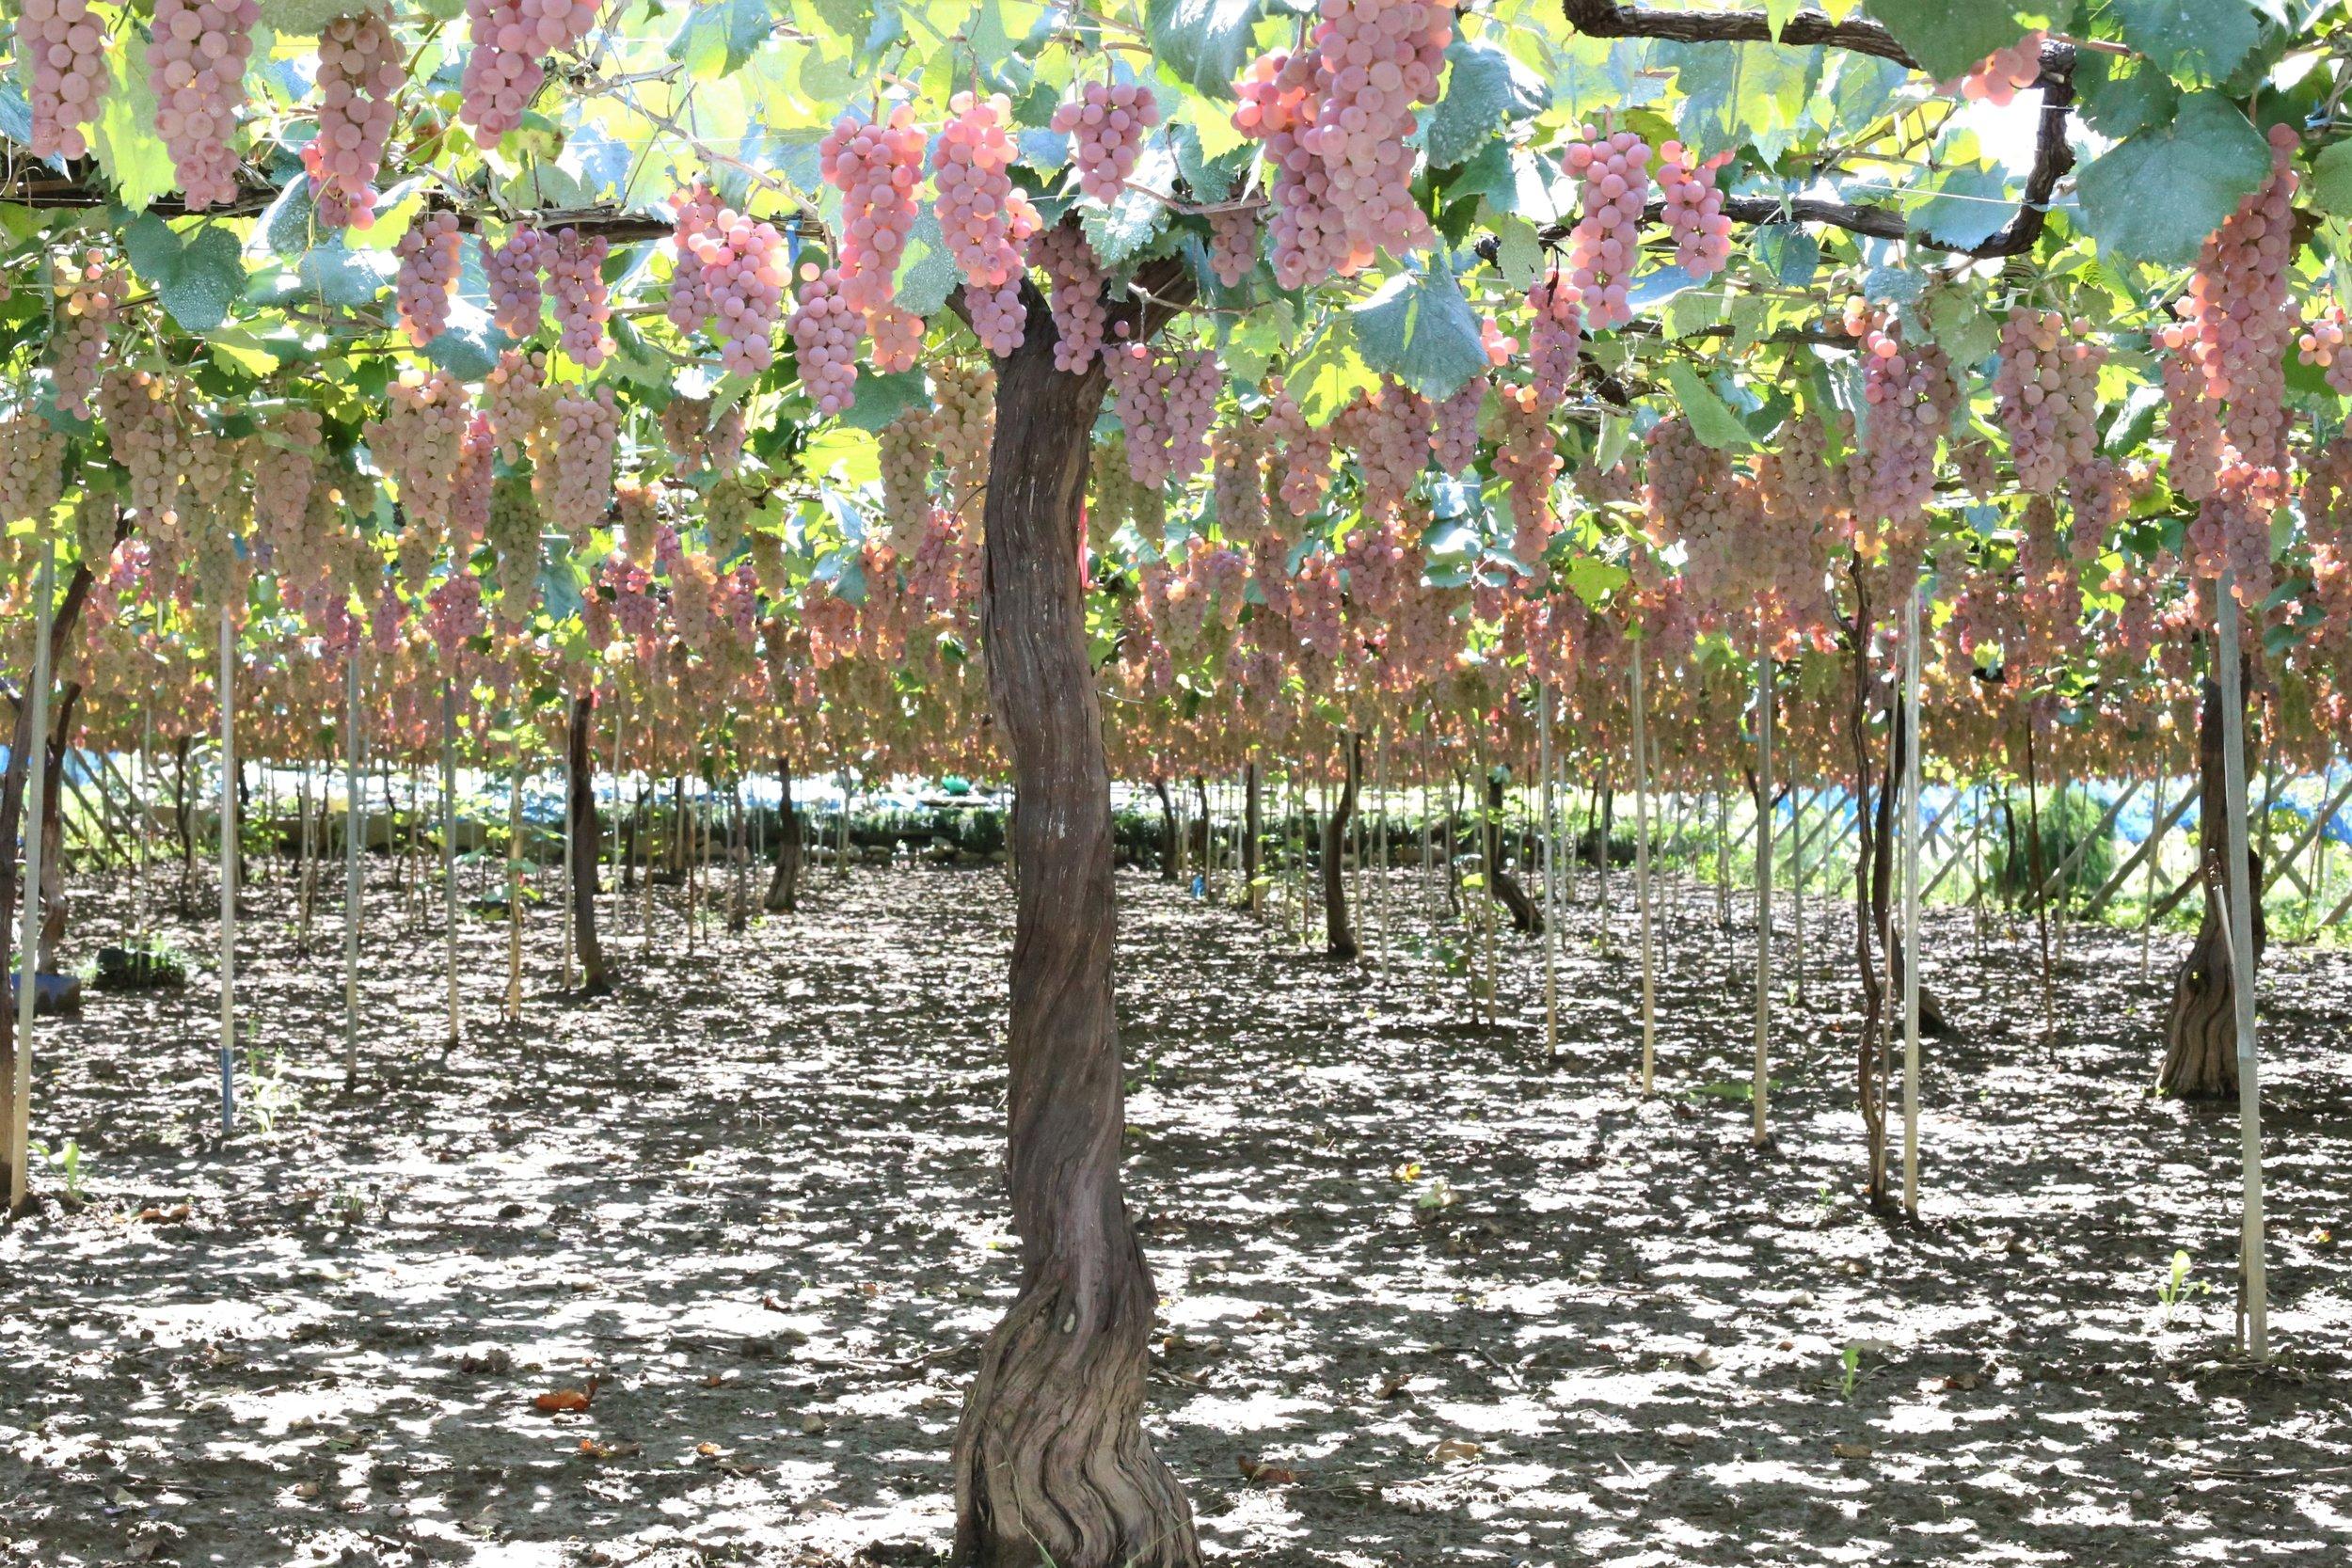 Koshu grapes grown with the Japanese overhead 'tanashiki' (pergola) trellising system, seen throughout the Koshu Valley.